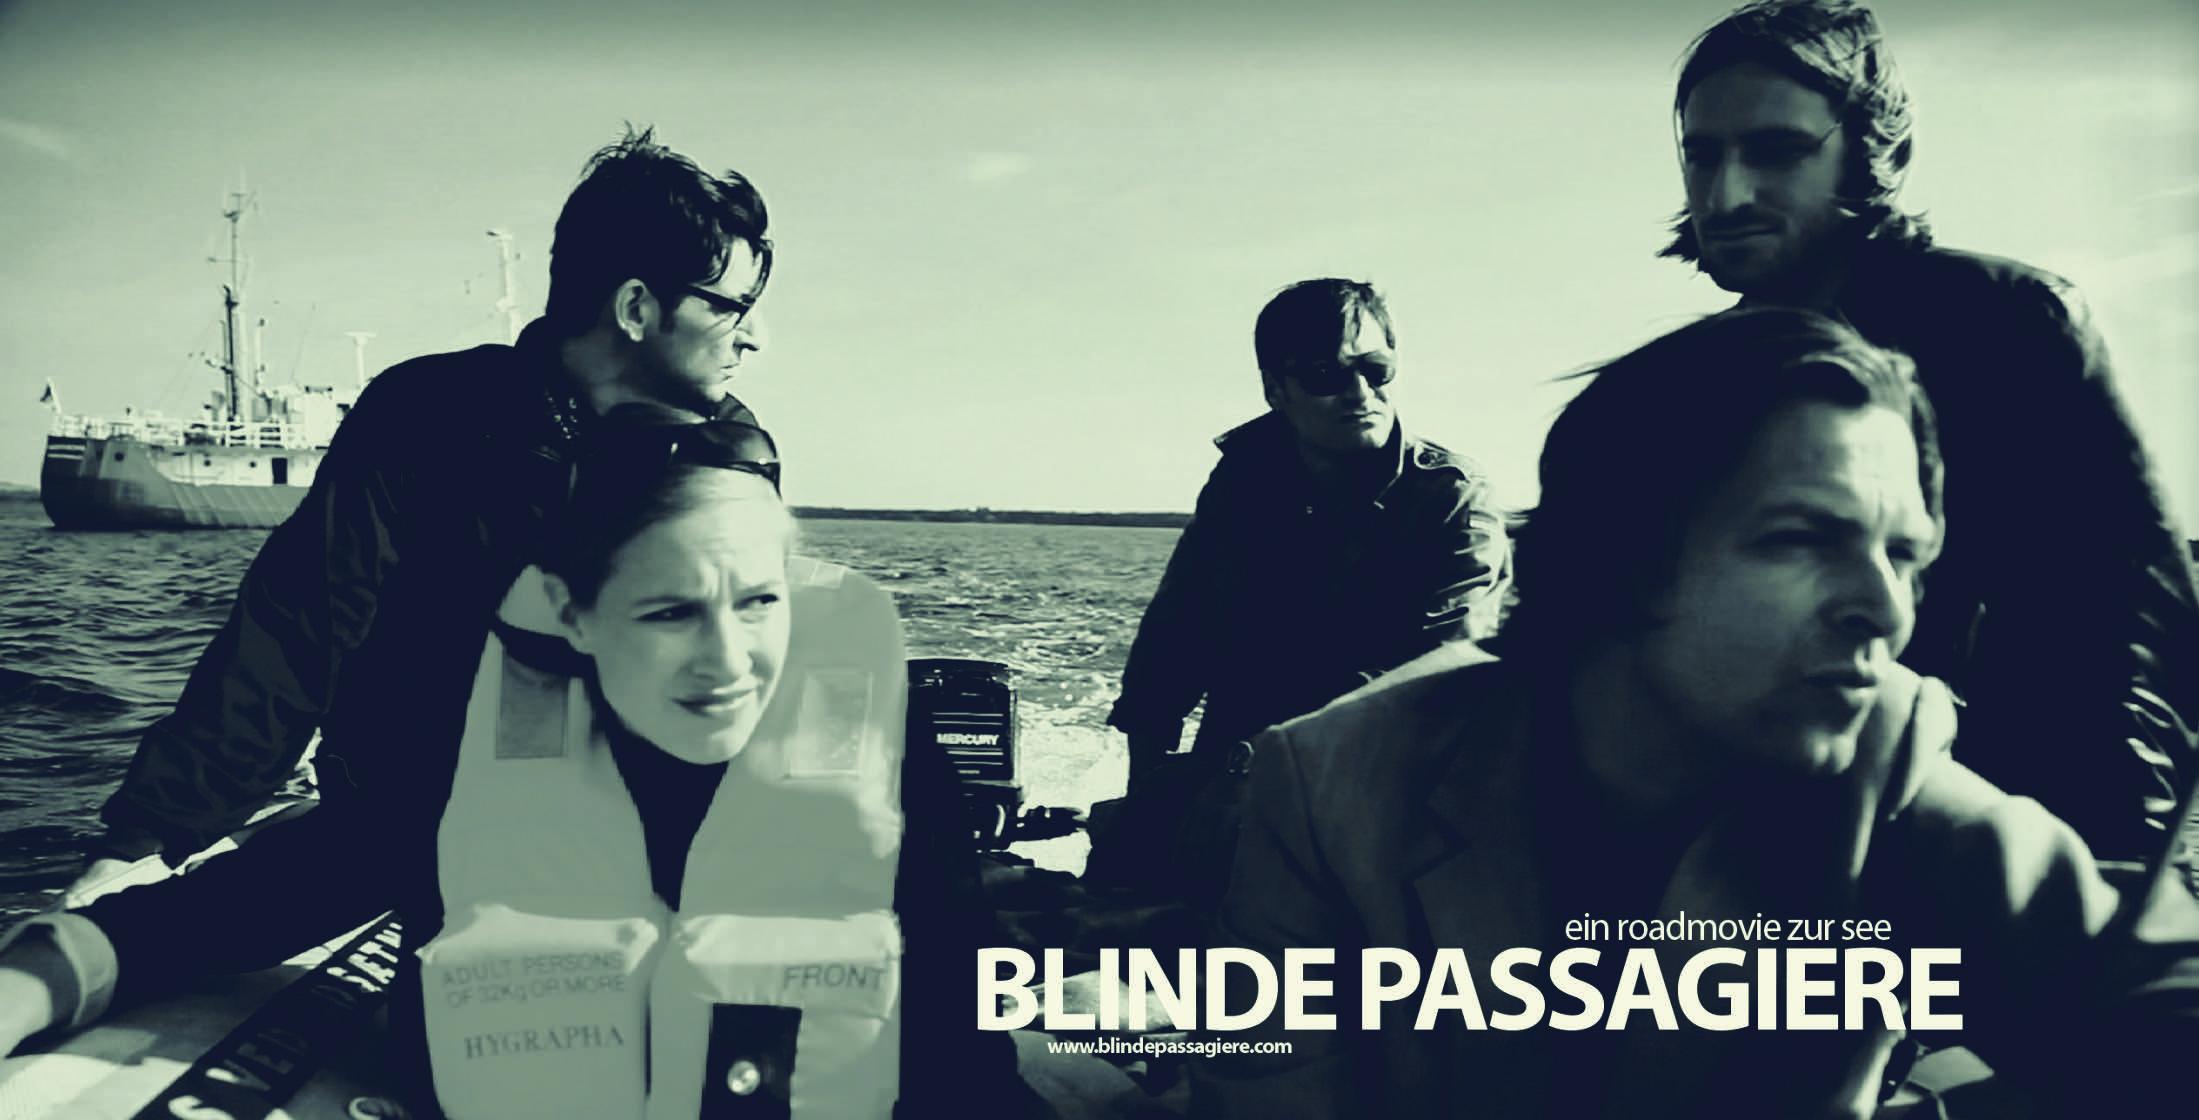 Blinde_Passagiere_Der_Film_Jarek_Raczek_sw